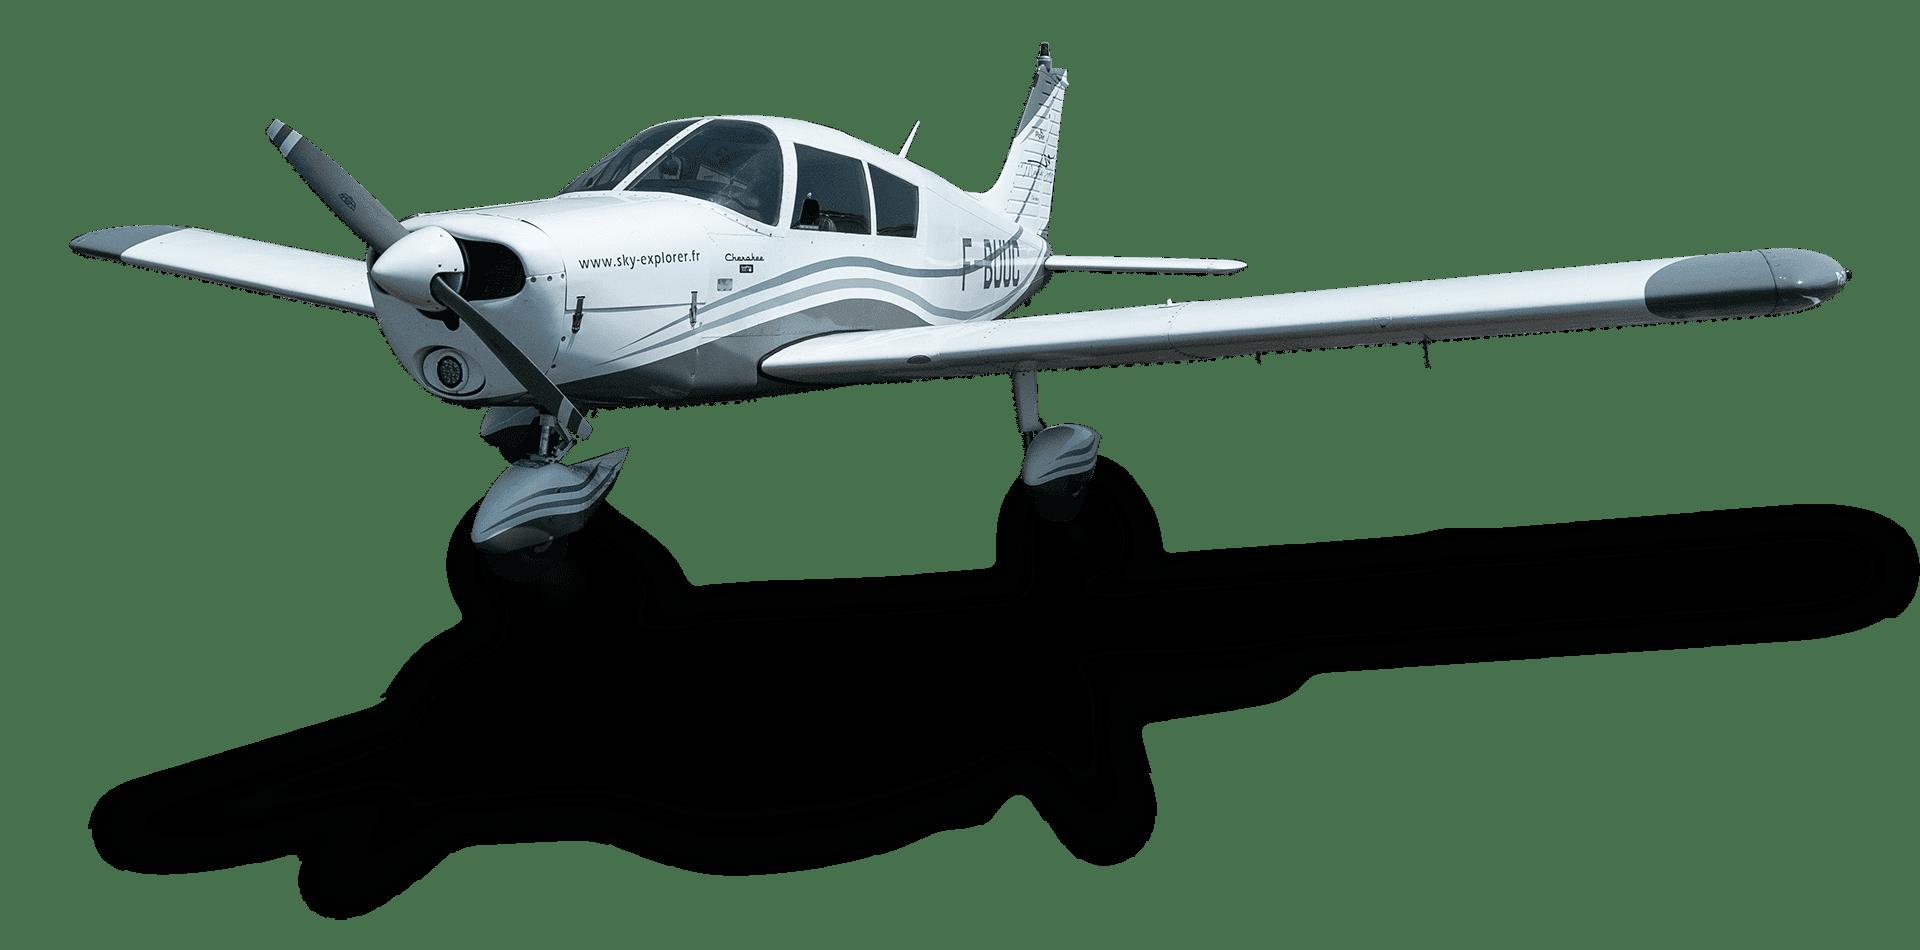 Piper Pa-28 Cherokee (F-BUUC) Sky Explorer Ecole Pro Aviation Aix Les Milles